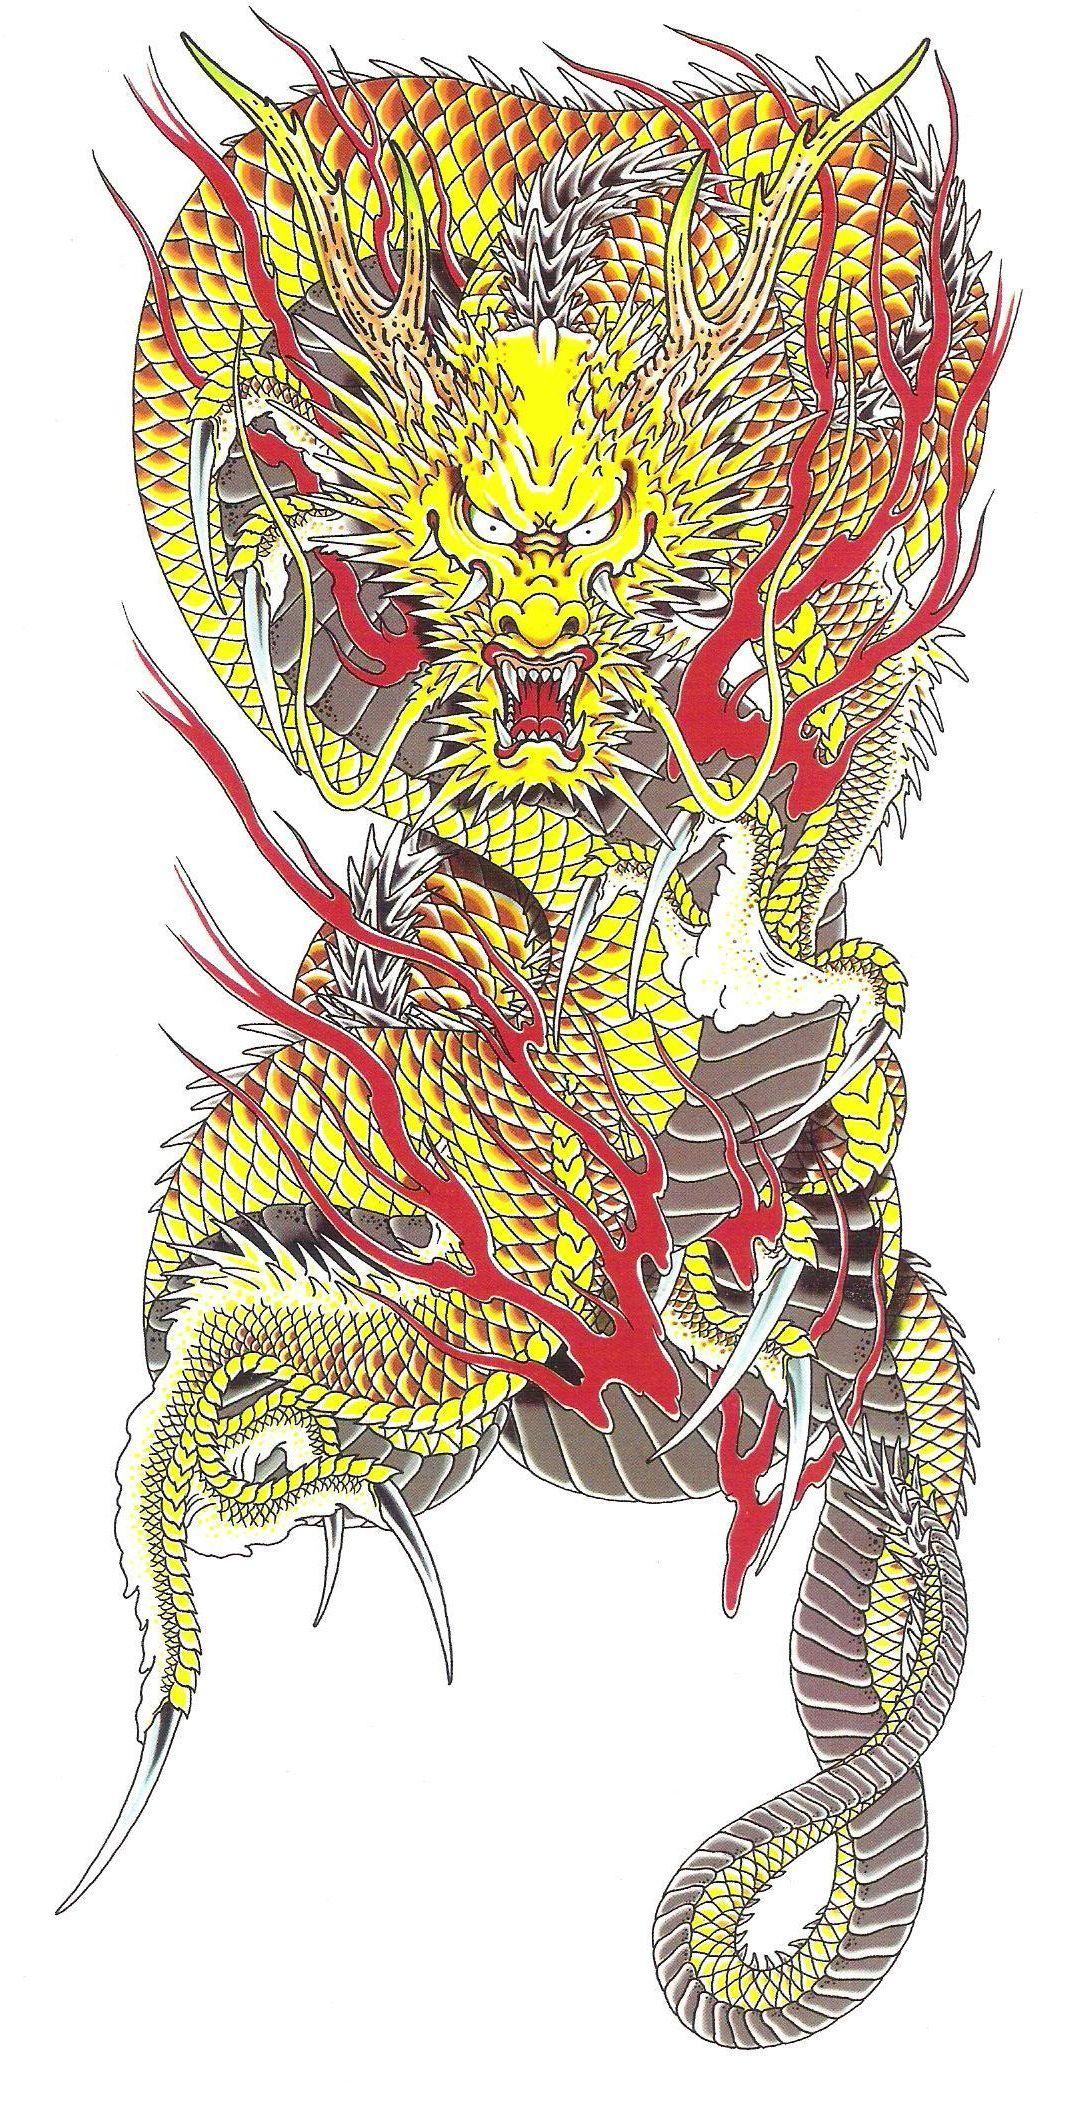 Forguys Designs Ideas Formen Minimalist Forwomen Sleeve Geometric Drawings Traditional Sketches In 2020 Japanese Dragon Tattoos Yakuza Tattoo Dragon Tattoo